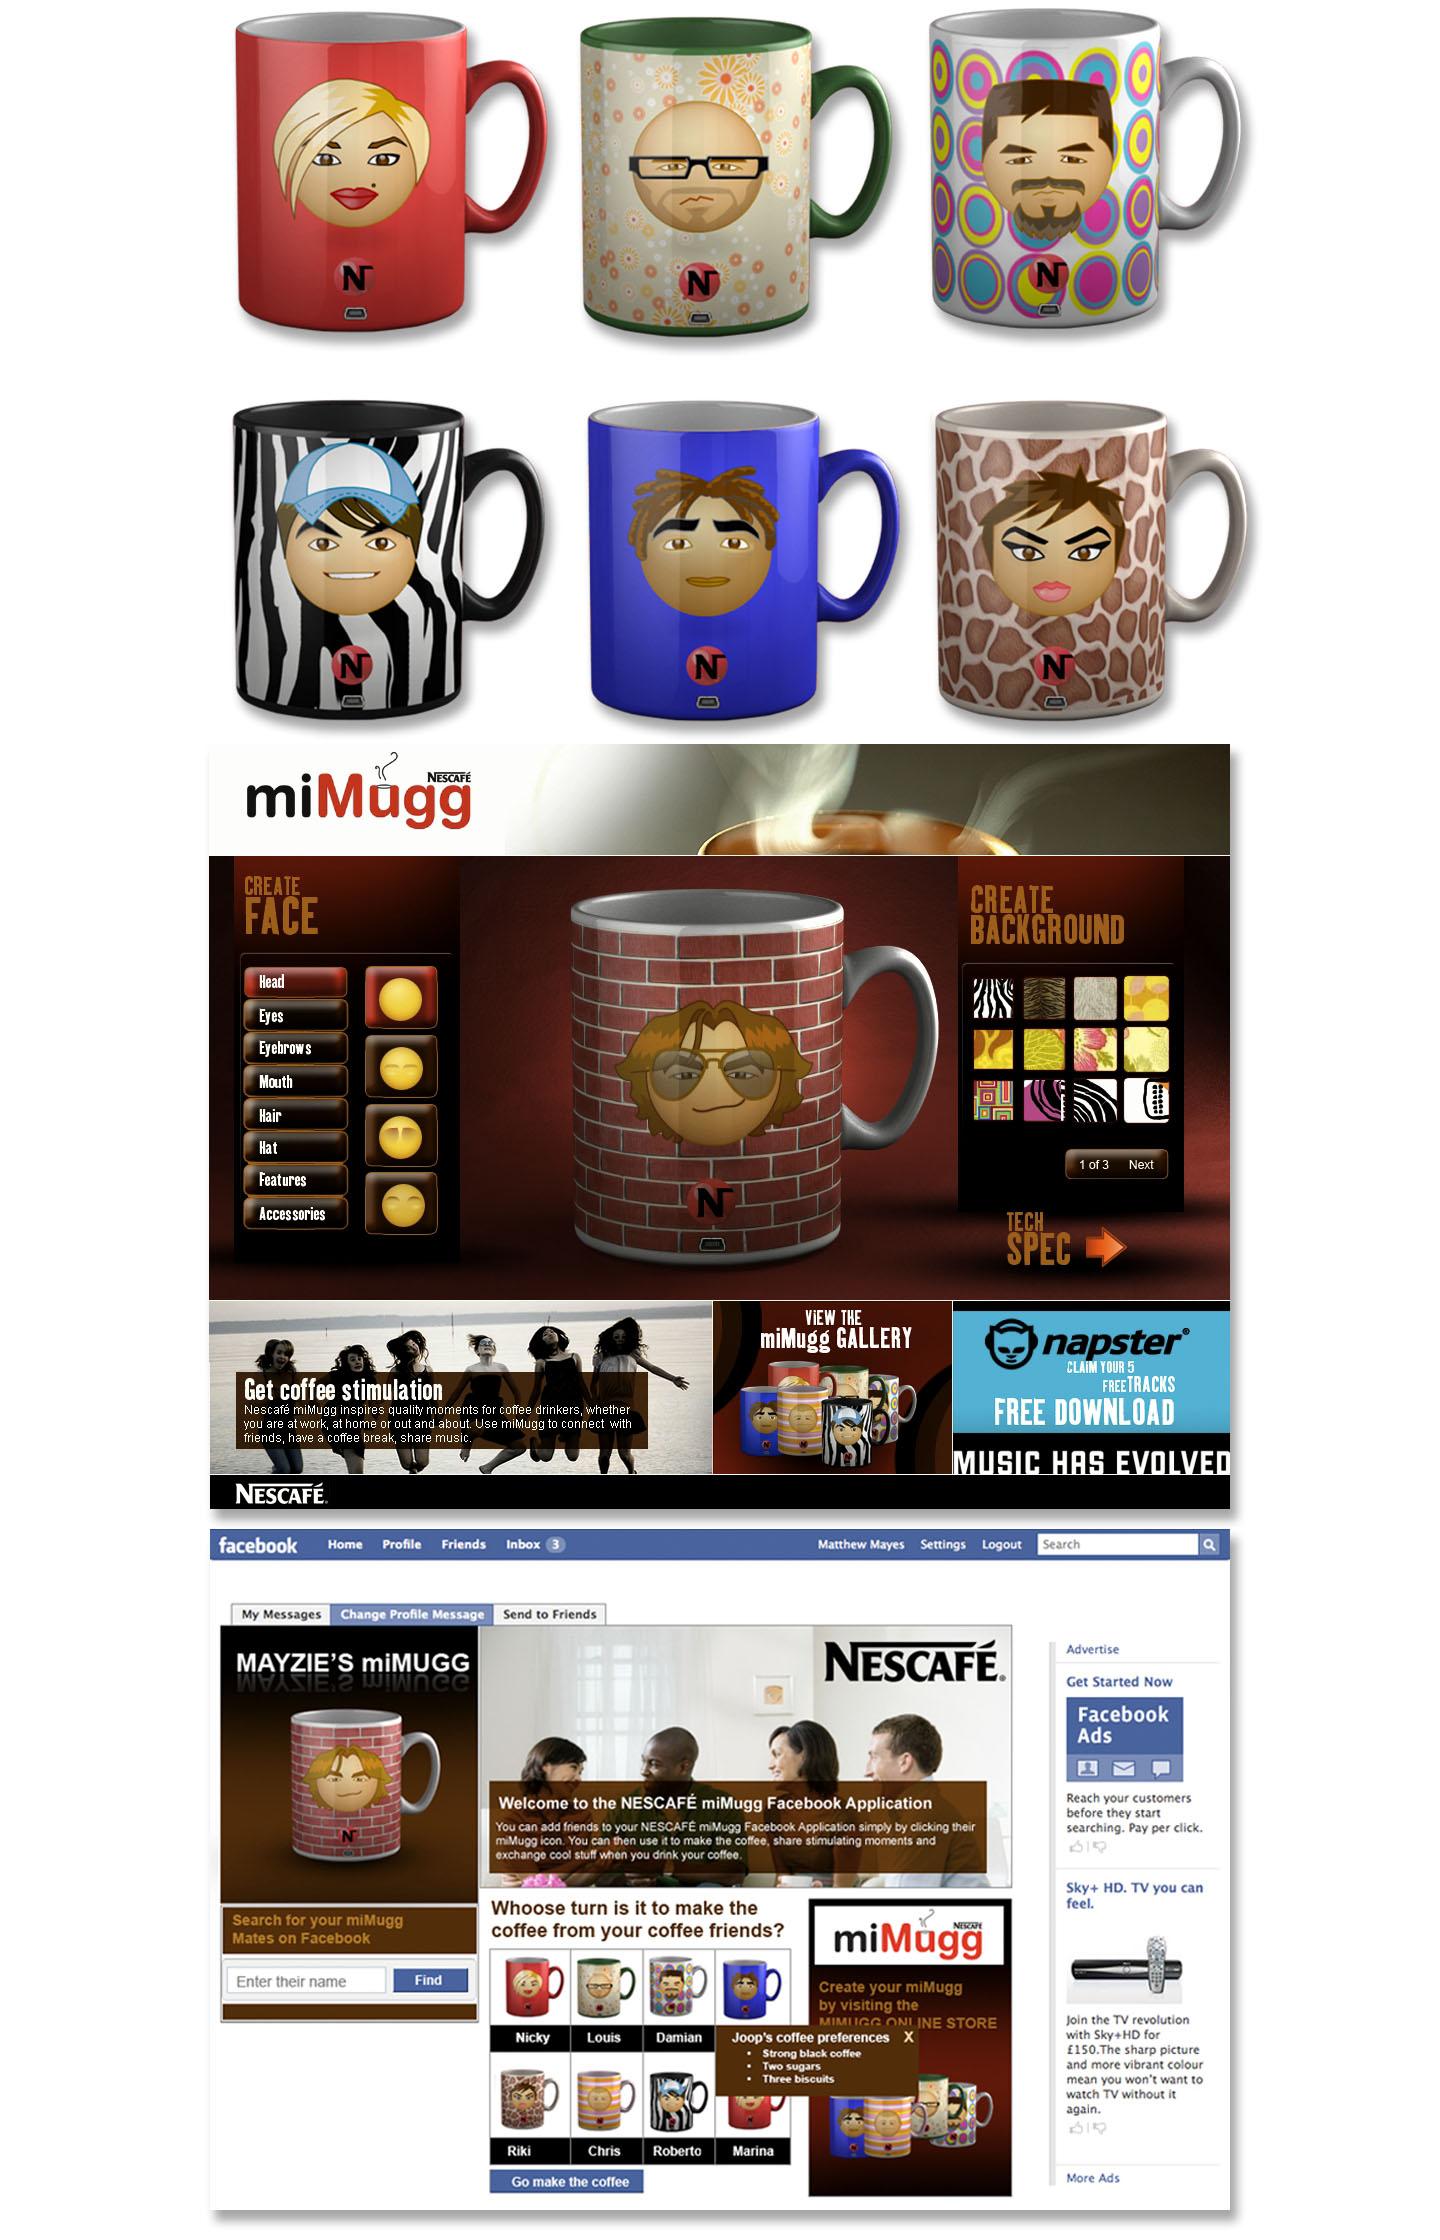 02 - Nescafe Mi Mugg Project